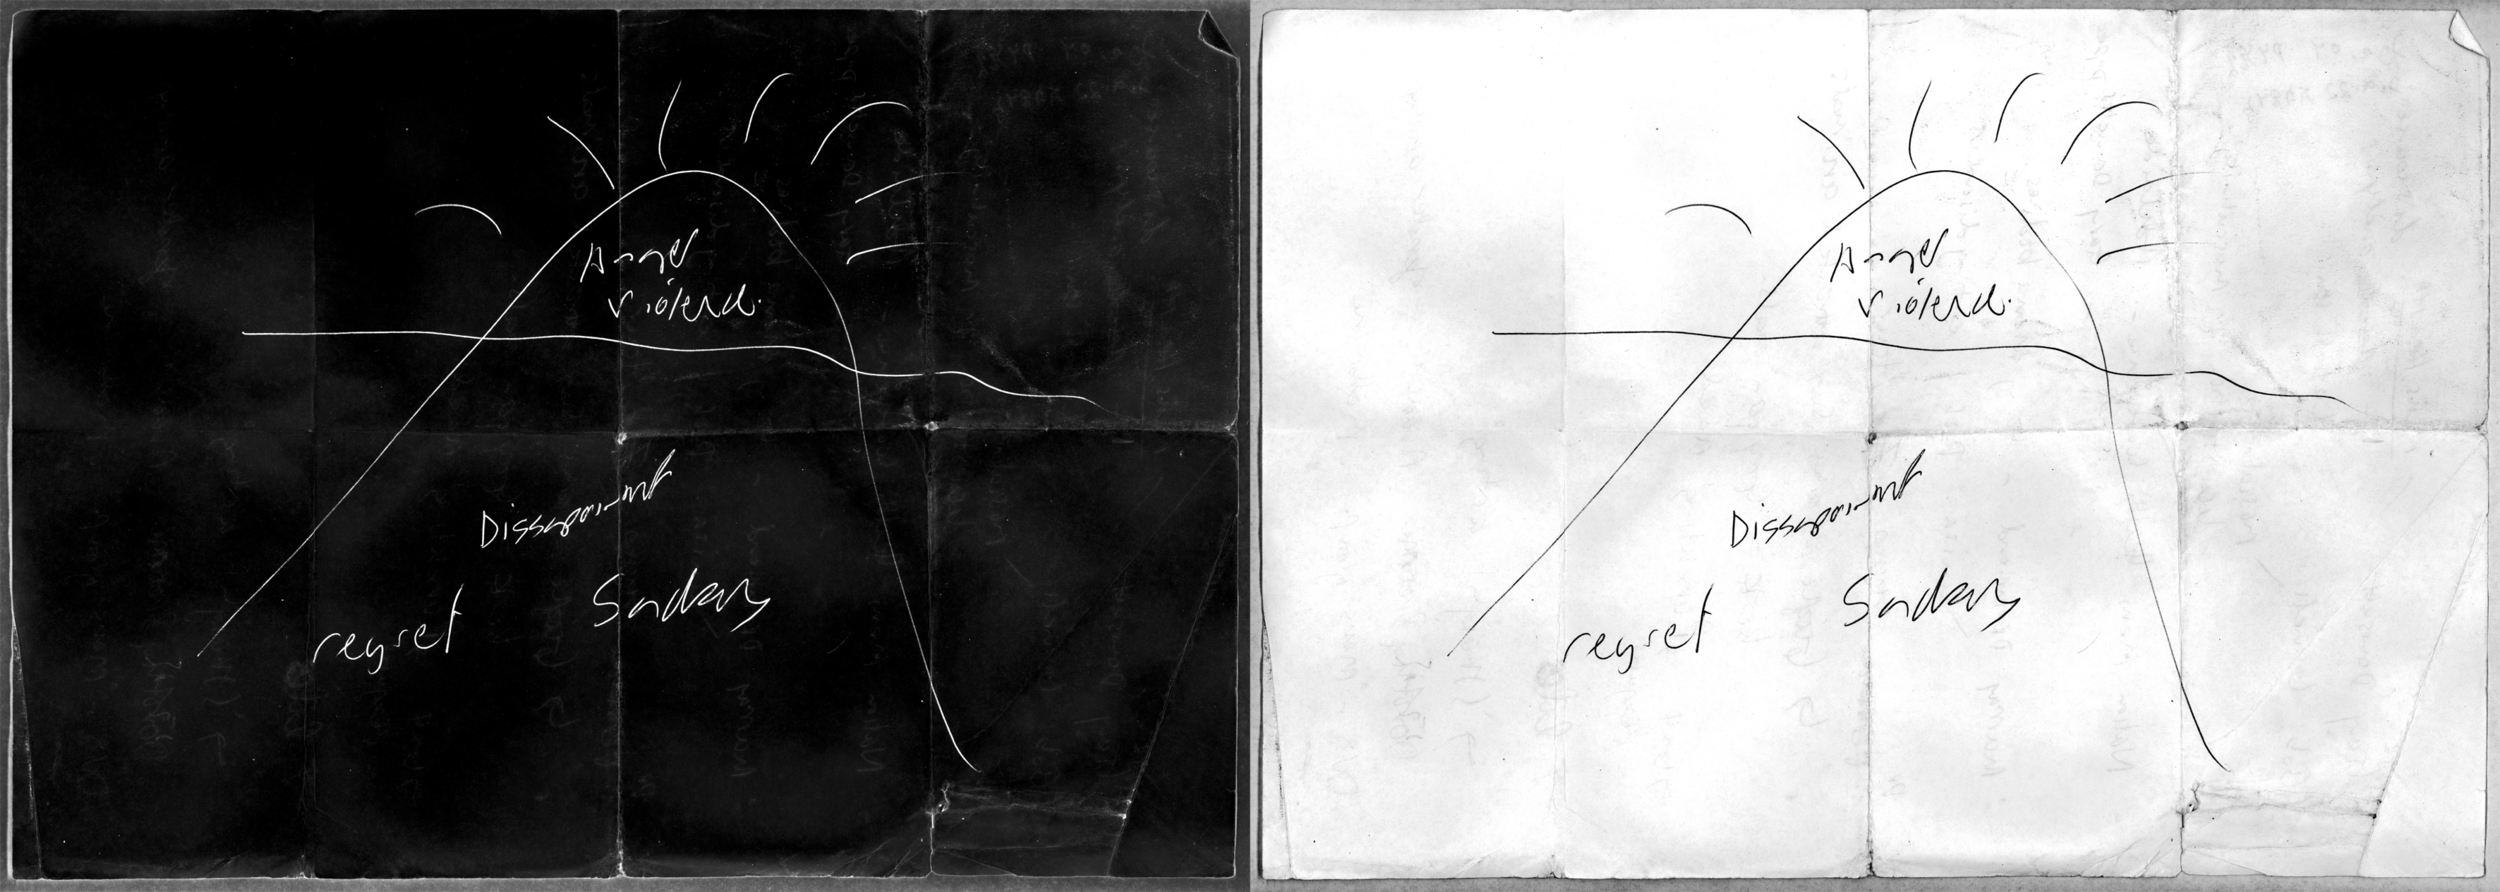 Matt Huppatz,  Man Mountain (Night)  (left),  Man Mountain (Day)  (right) 2012. Giclee prints on art paper, each 59.5cm x 84cm. Courtesy of the artist.